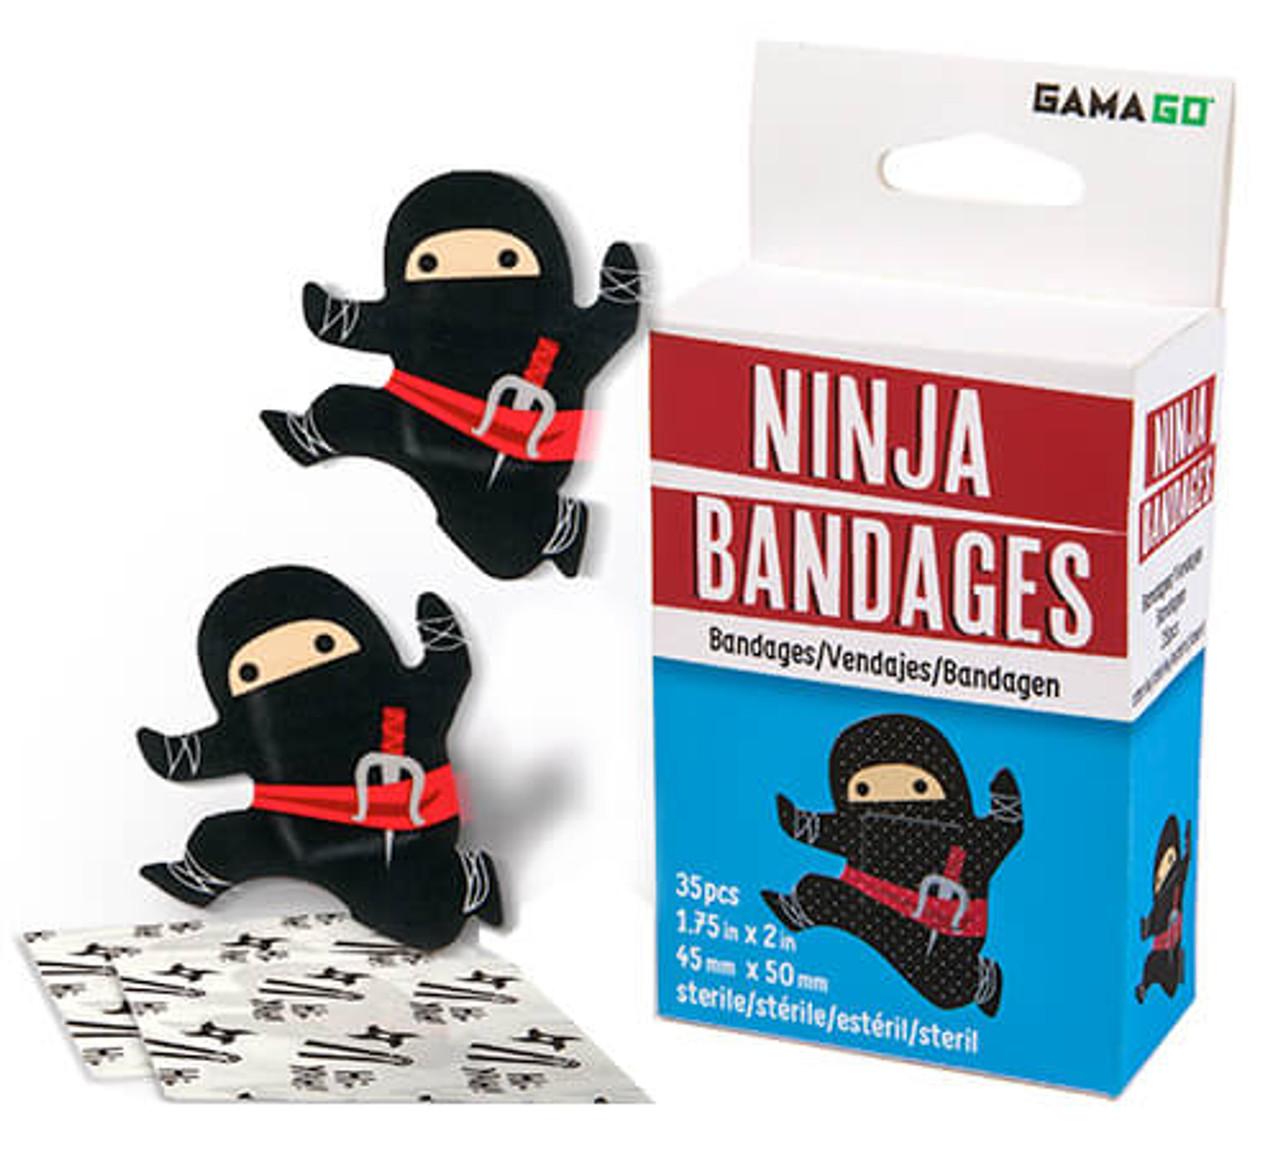 NEW GAMA-GO NINJA BANDAGES